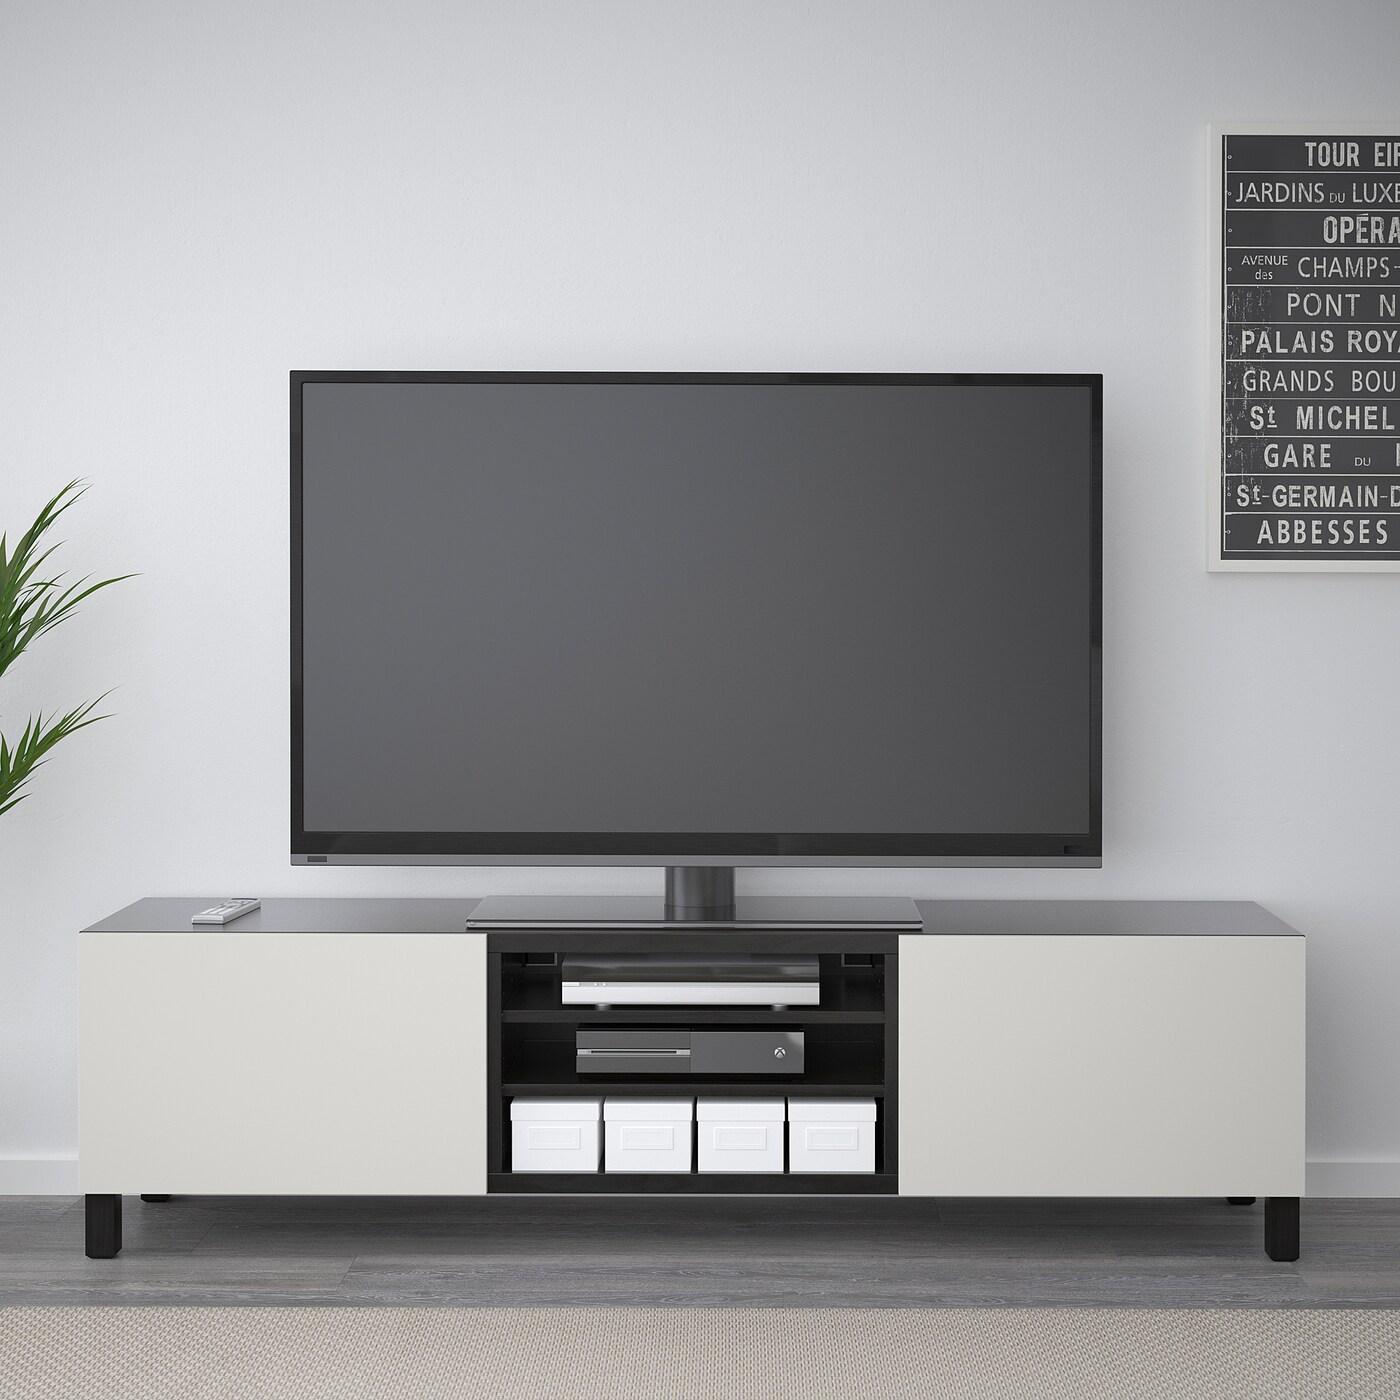 Full Size of Best Tv Bench With Drawers Black Brown Sofa Led Mit Küche Kaufen Ikea Deckenleuchte Bad Lederpflege Lampen Beleuchtung Wohnzimmer Wildleder Einbauleuchten Wohnzimmer Ikea Led Panel